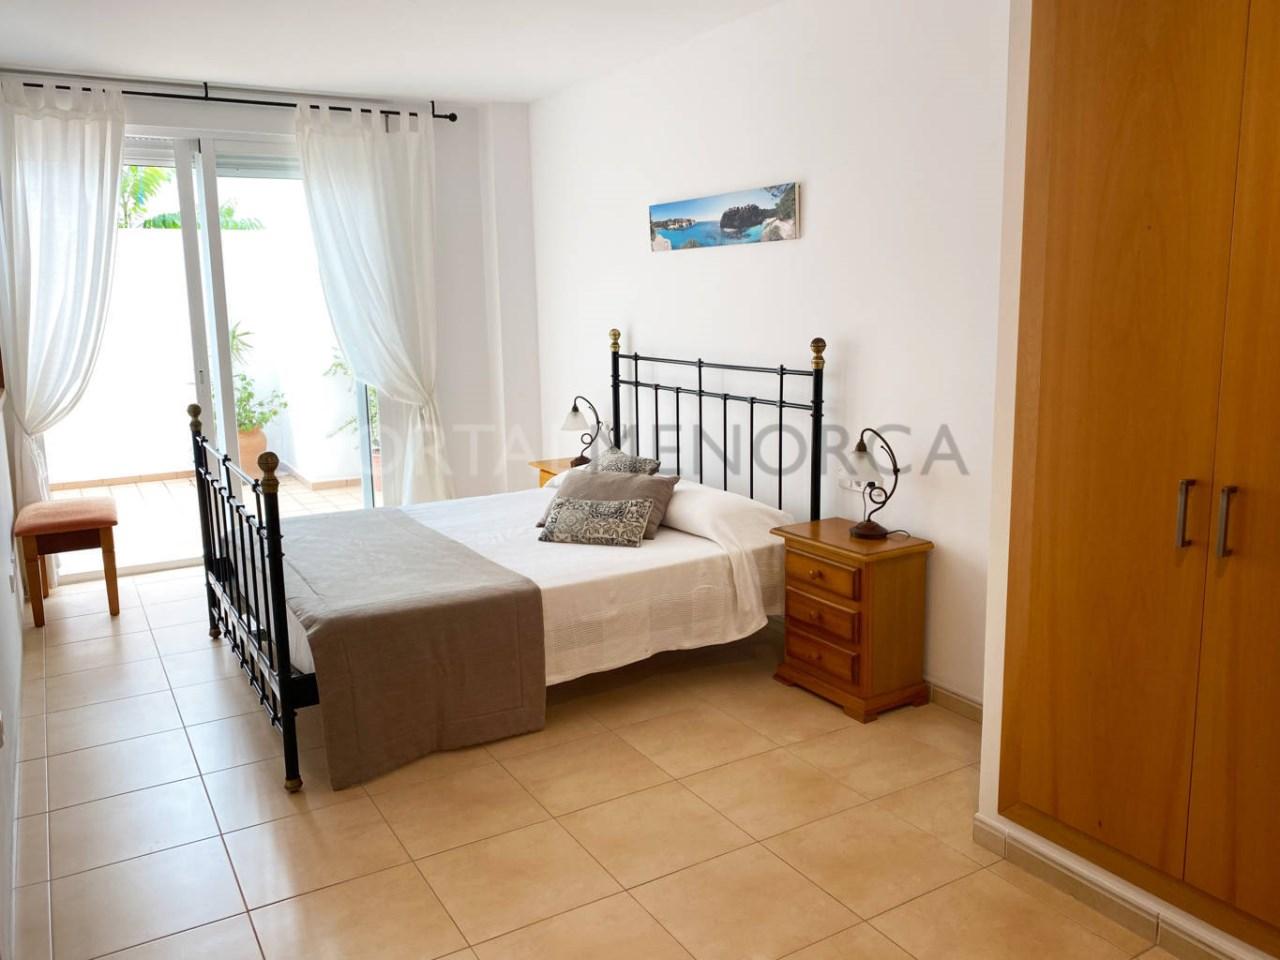 Ground floor in Ciutadella_bedroom